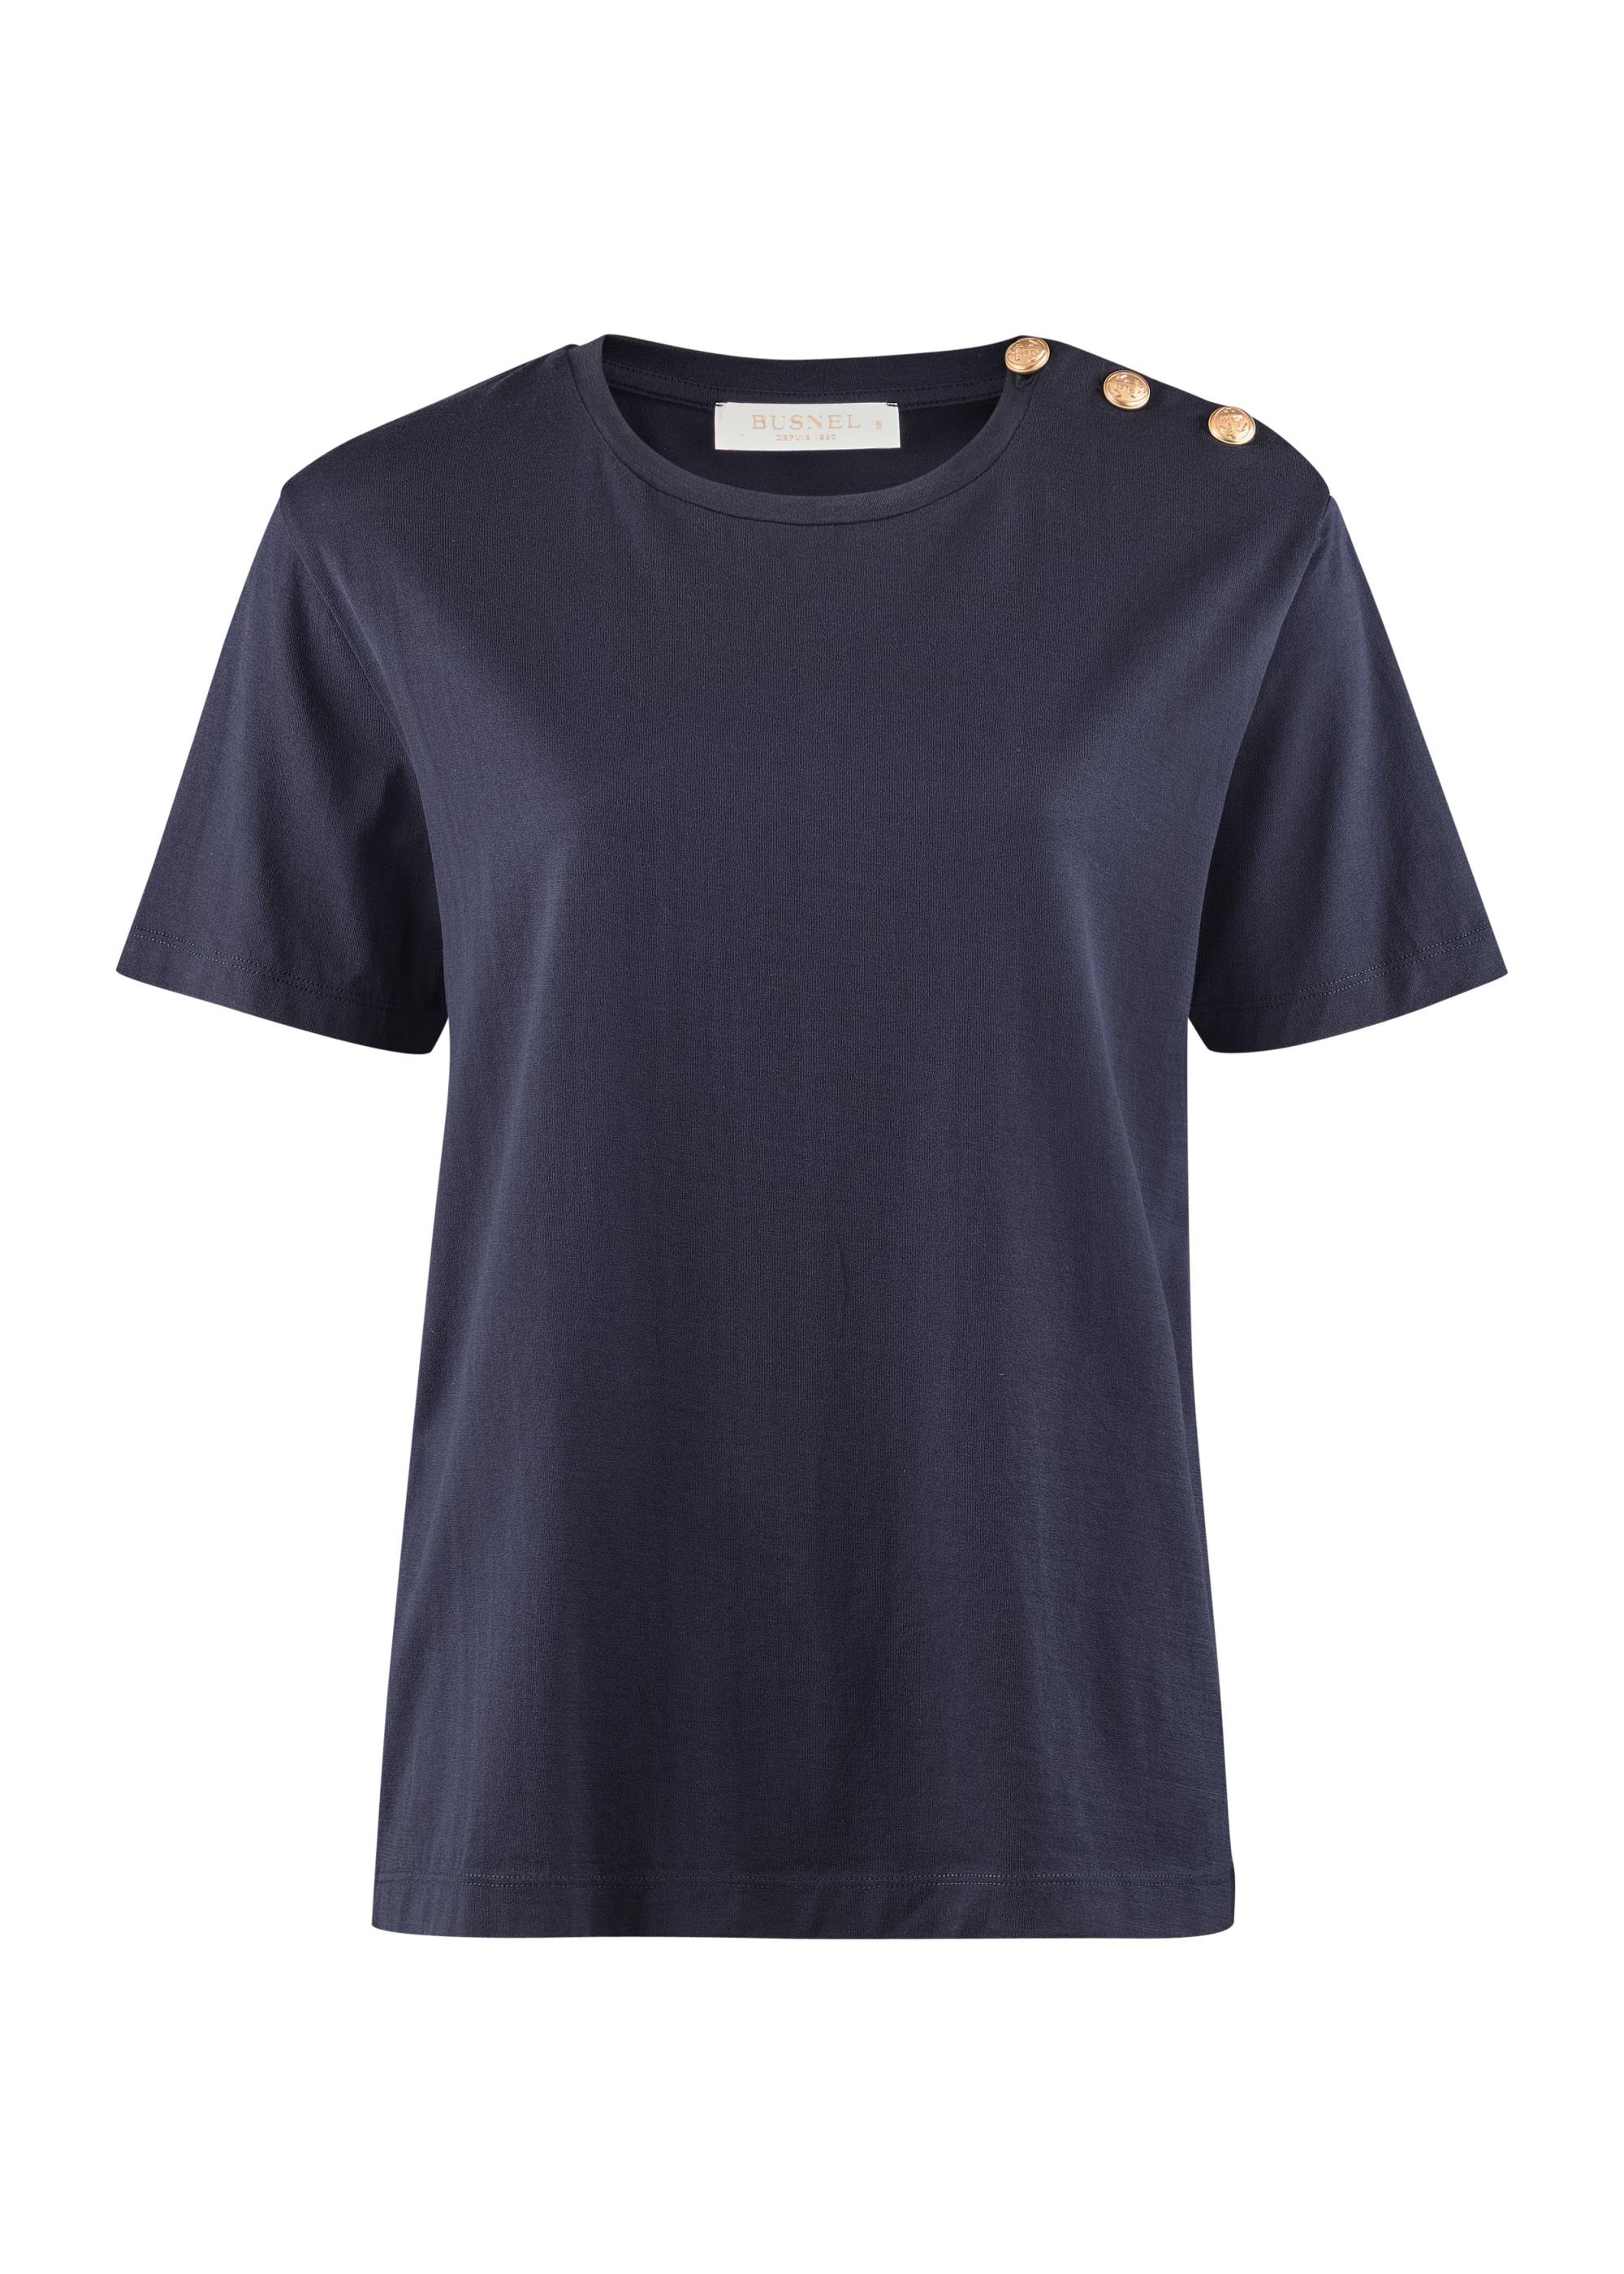 Toulon T-shirt Marine-1